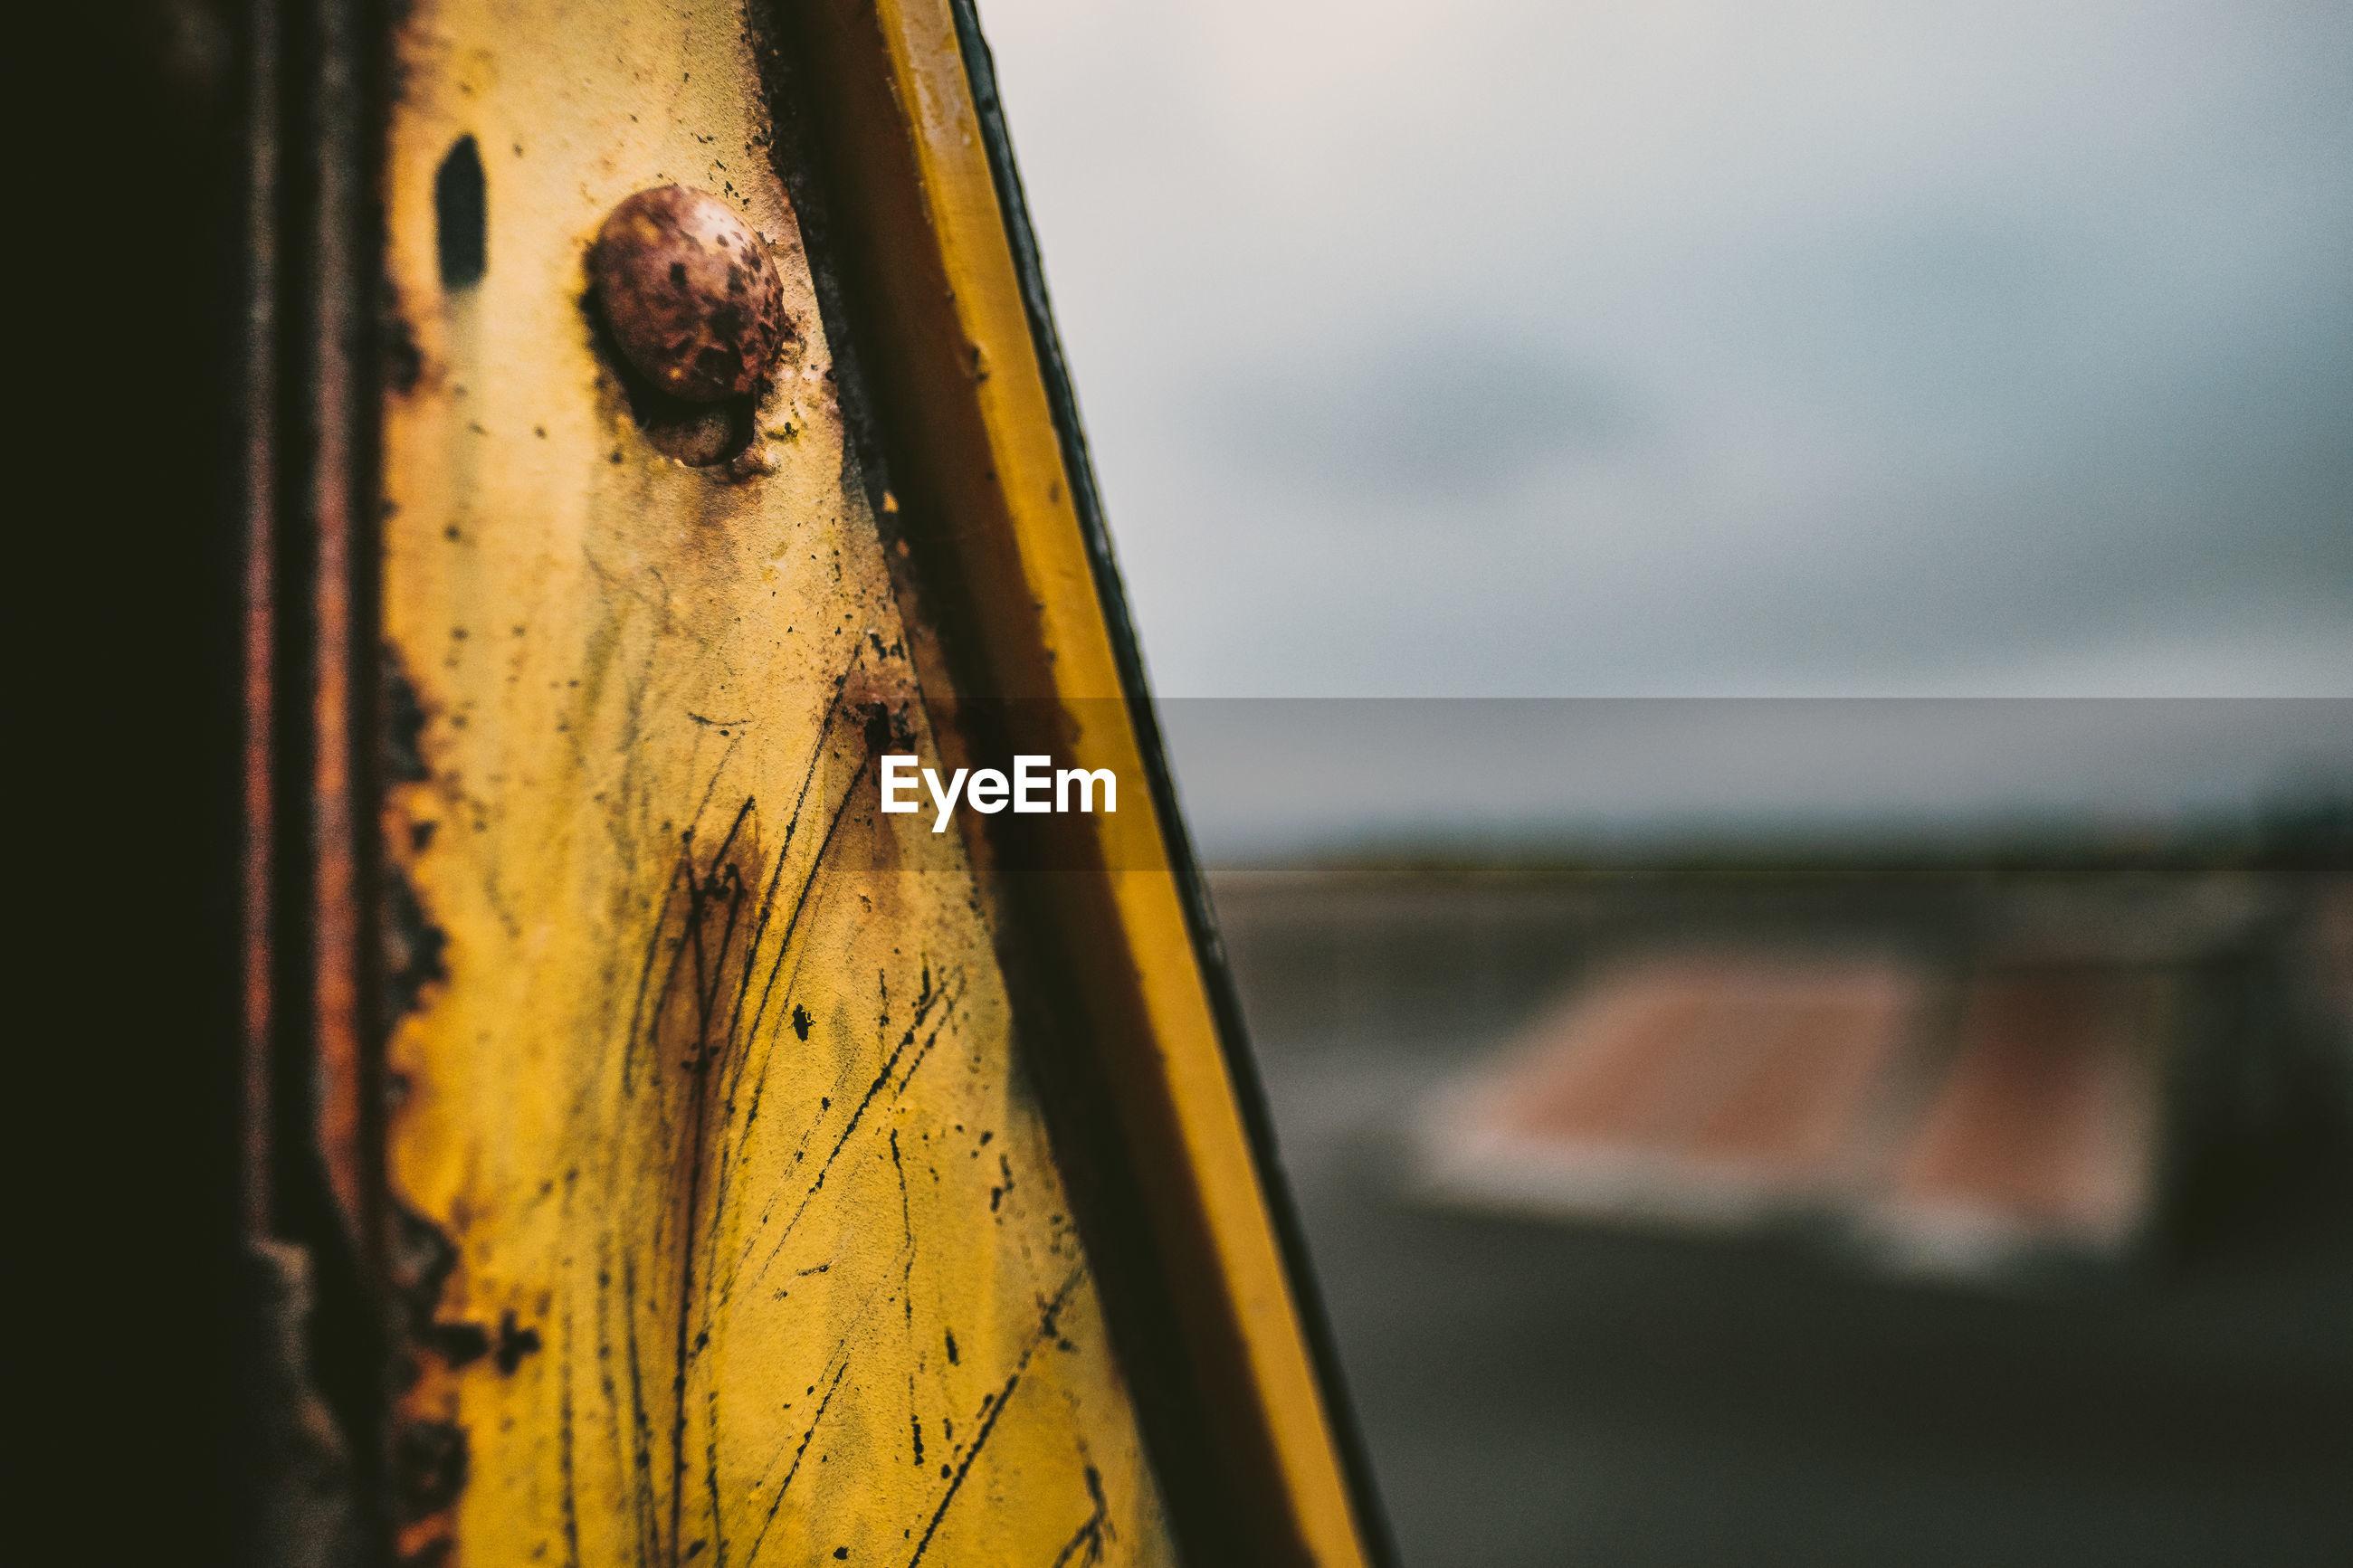 Close-up of yellow rusty metal